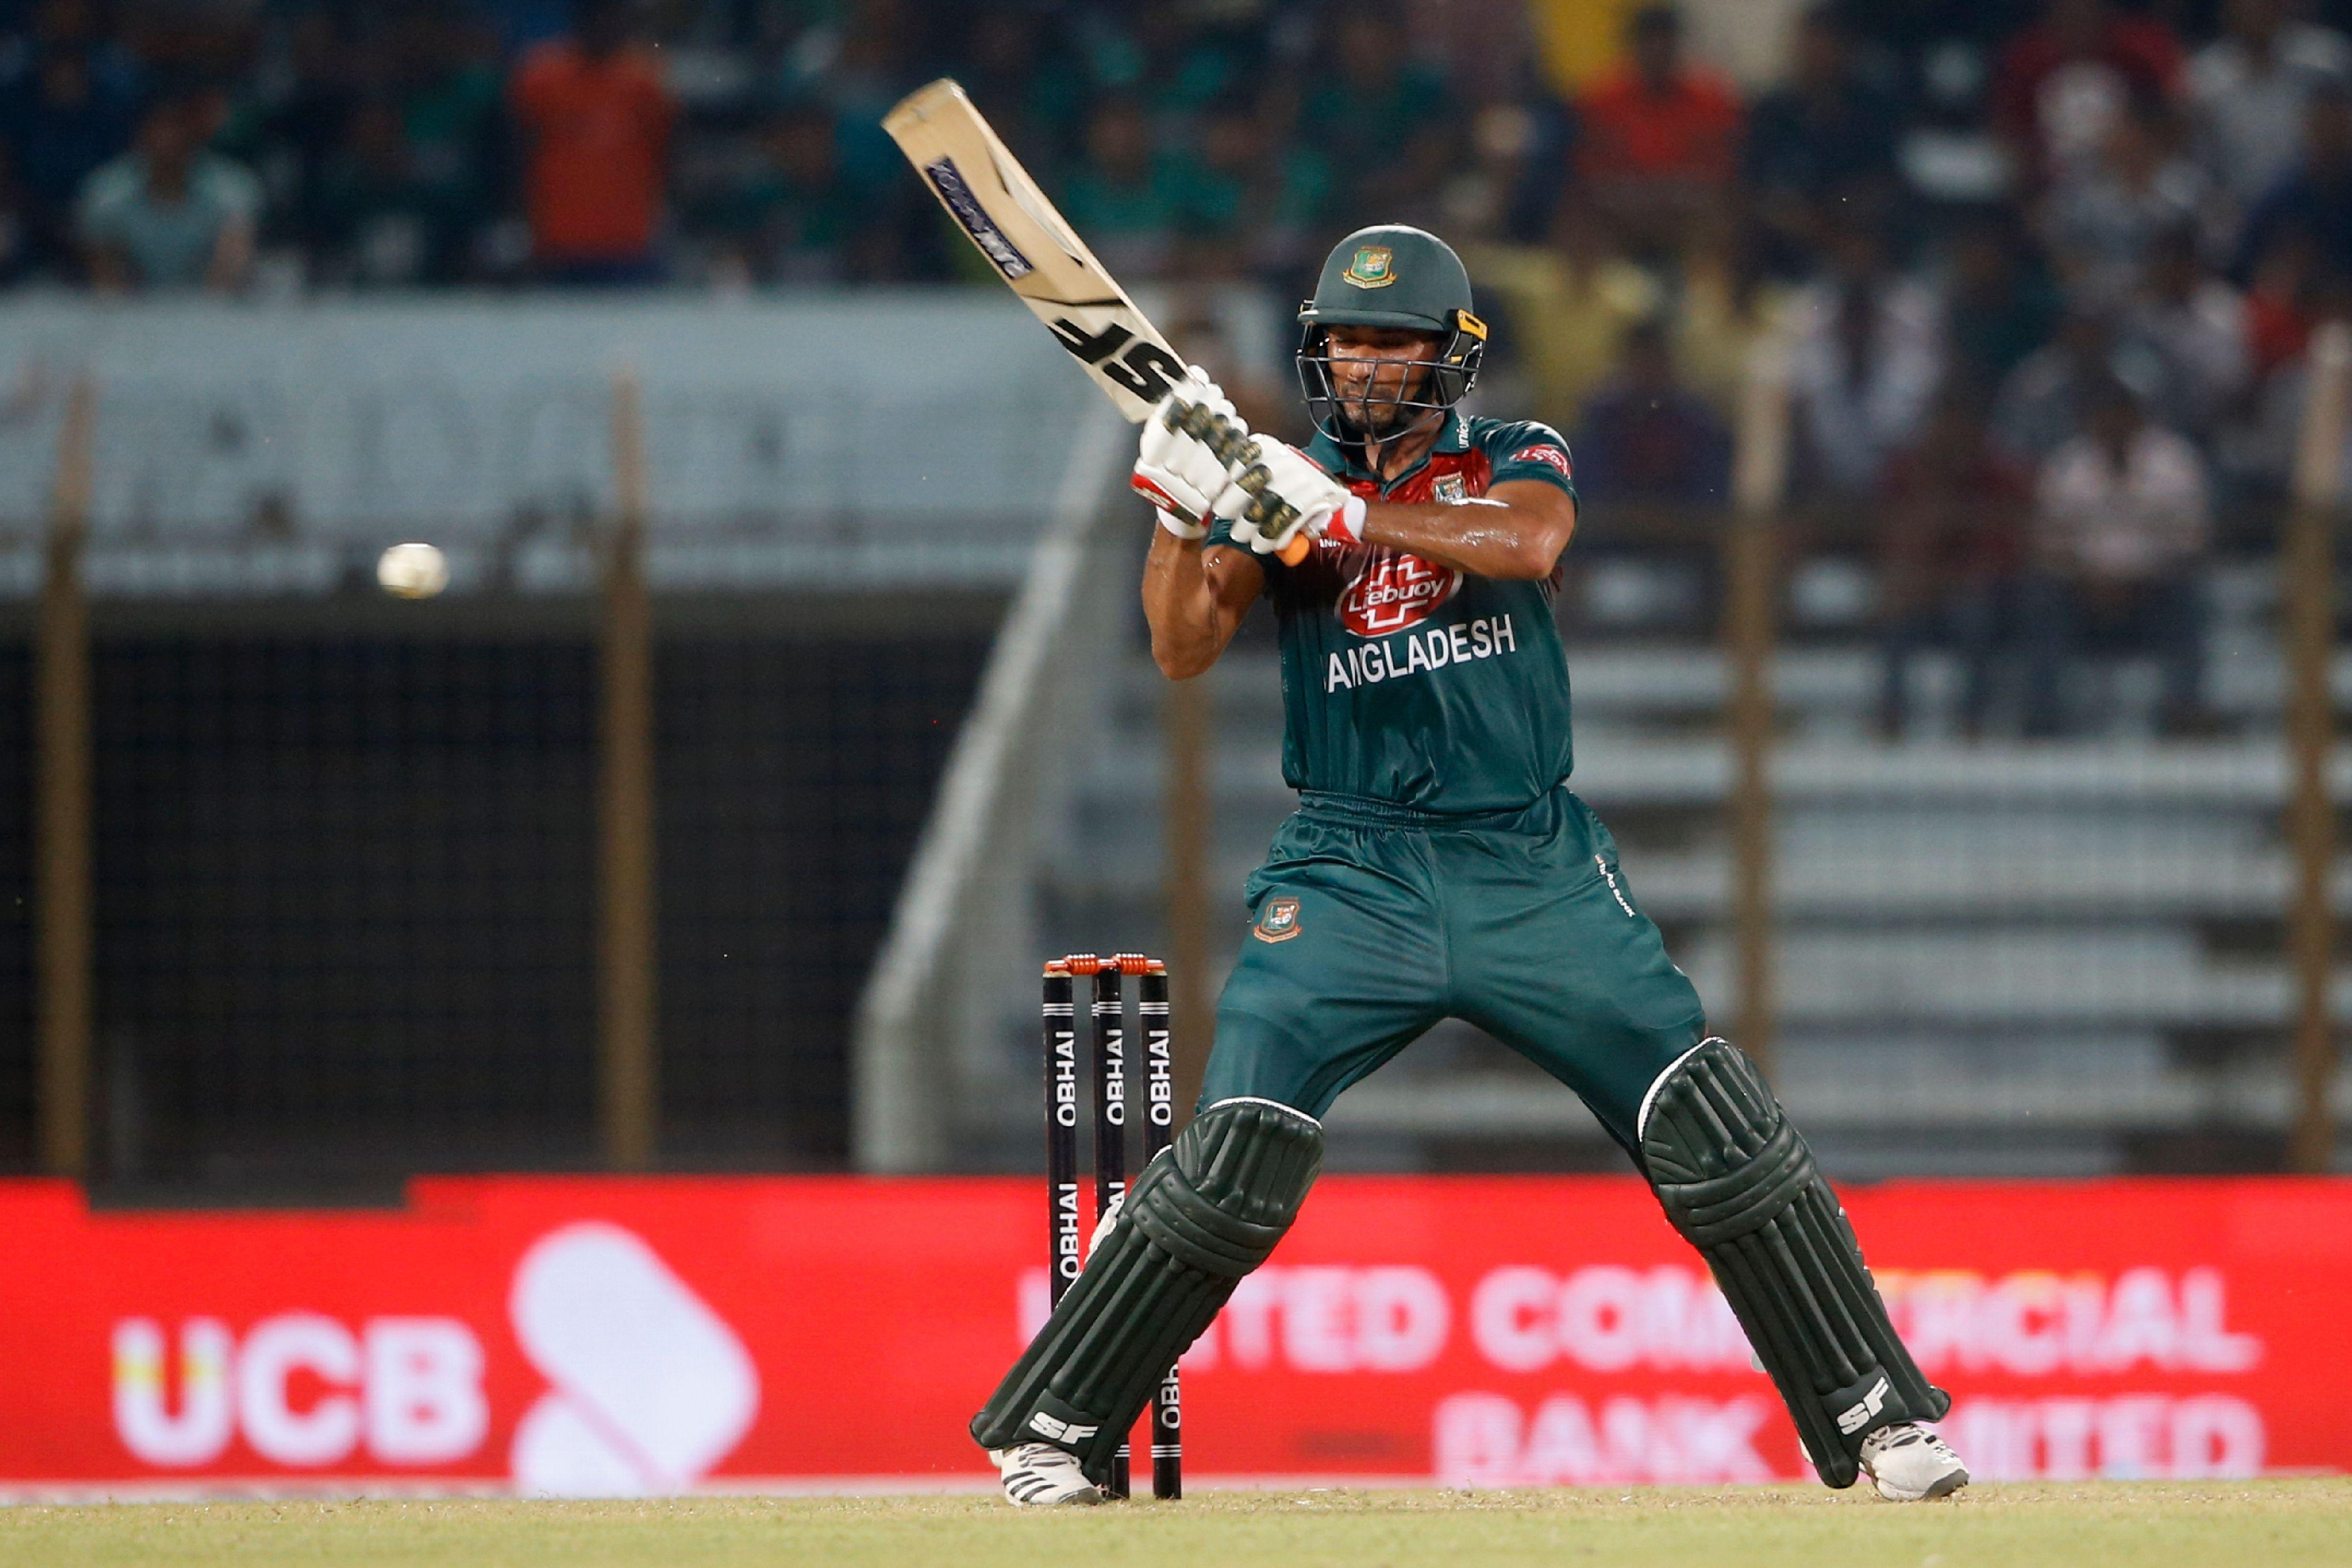 Mahmudullah blitz sets up convincing Bangladesh win over Zimbabwe